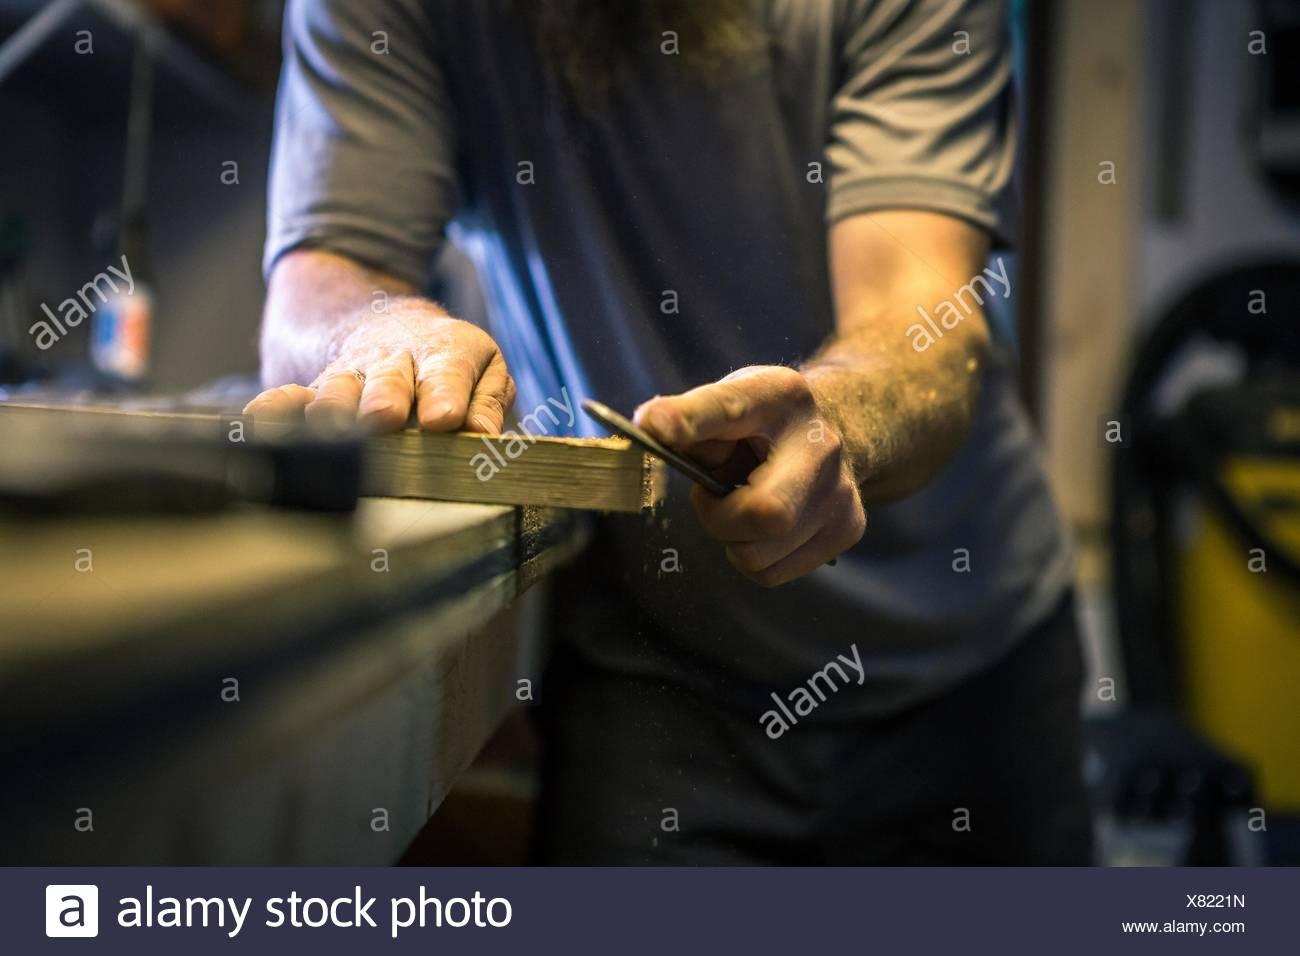 Holzkünstler arbeiten in Werkstatt, Mittelteil Stockbild